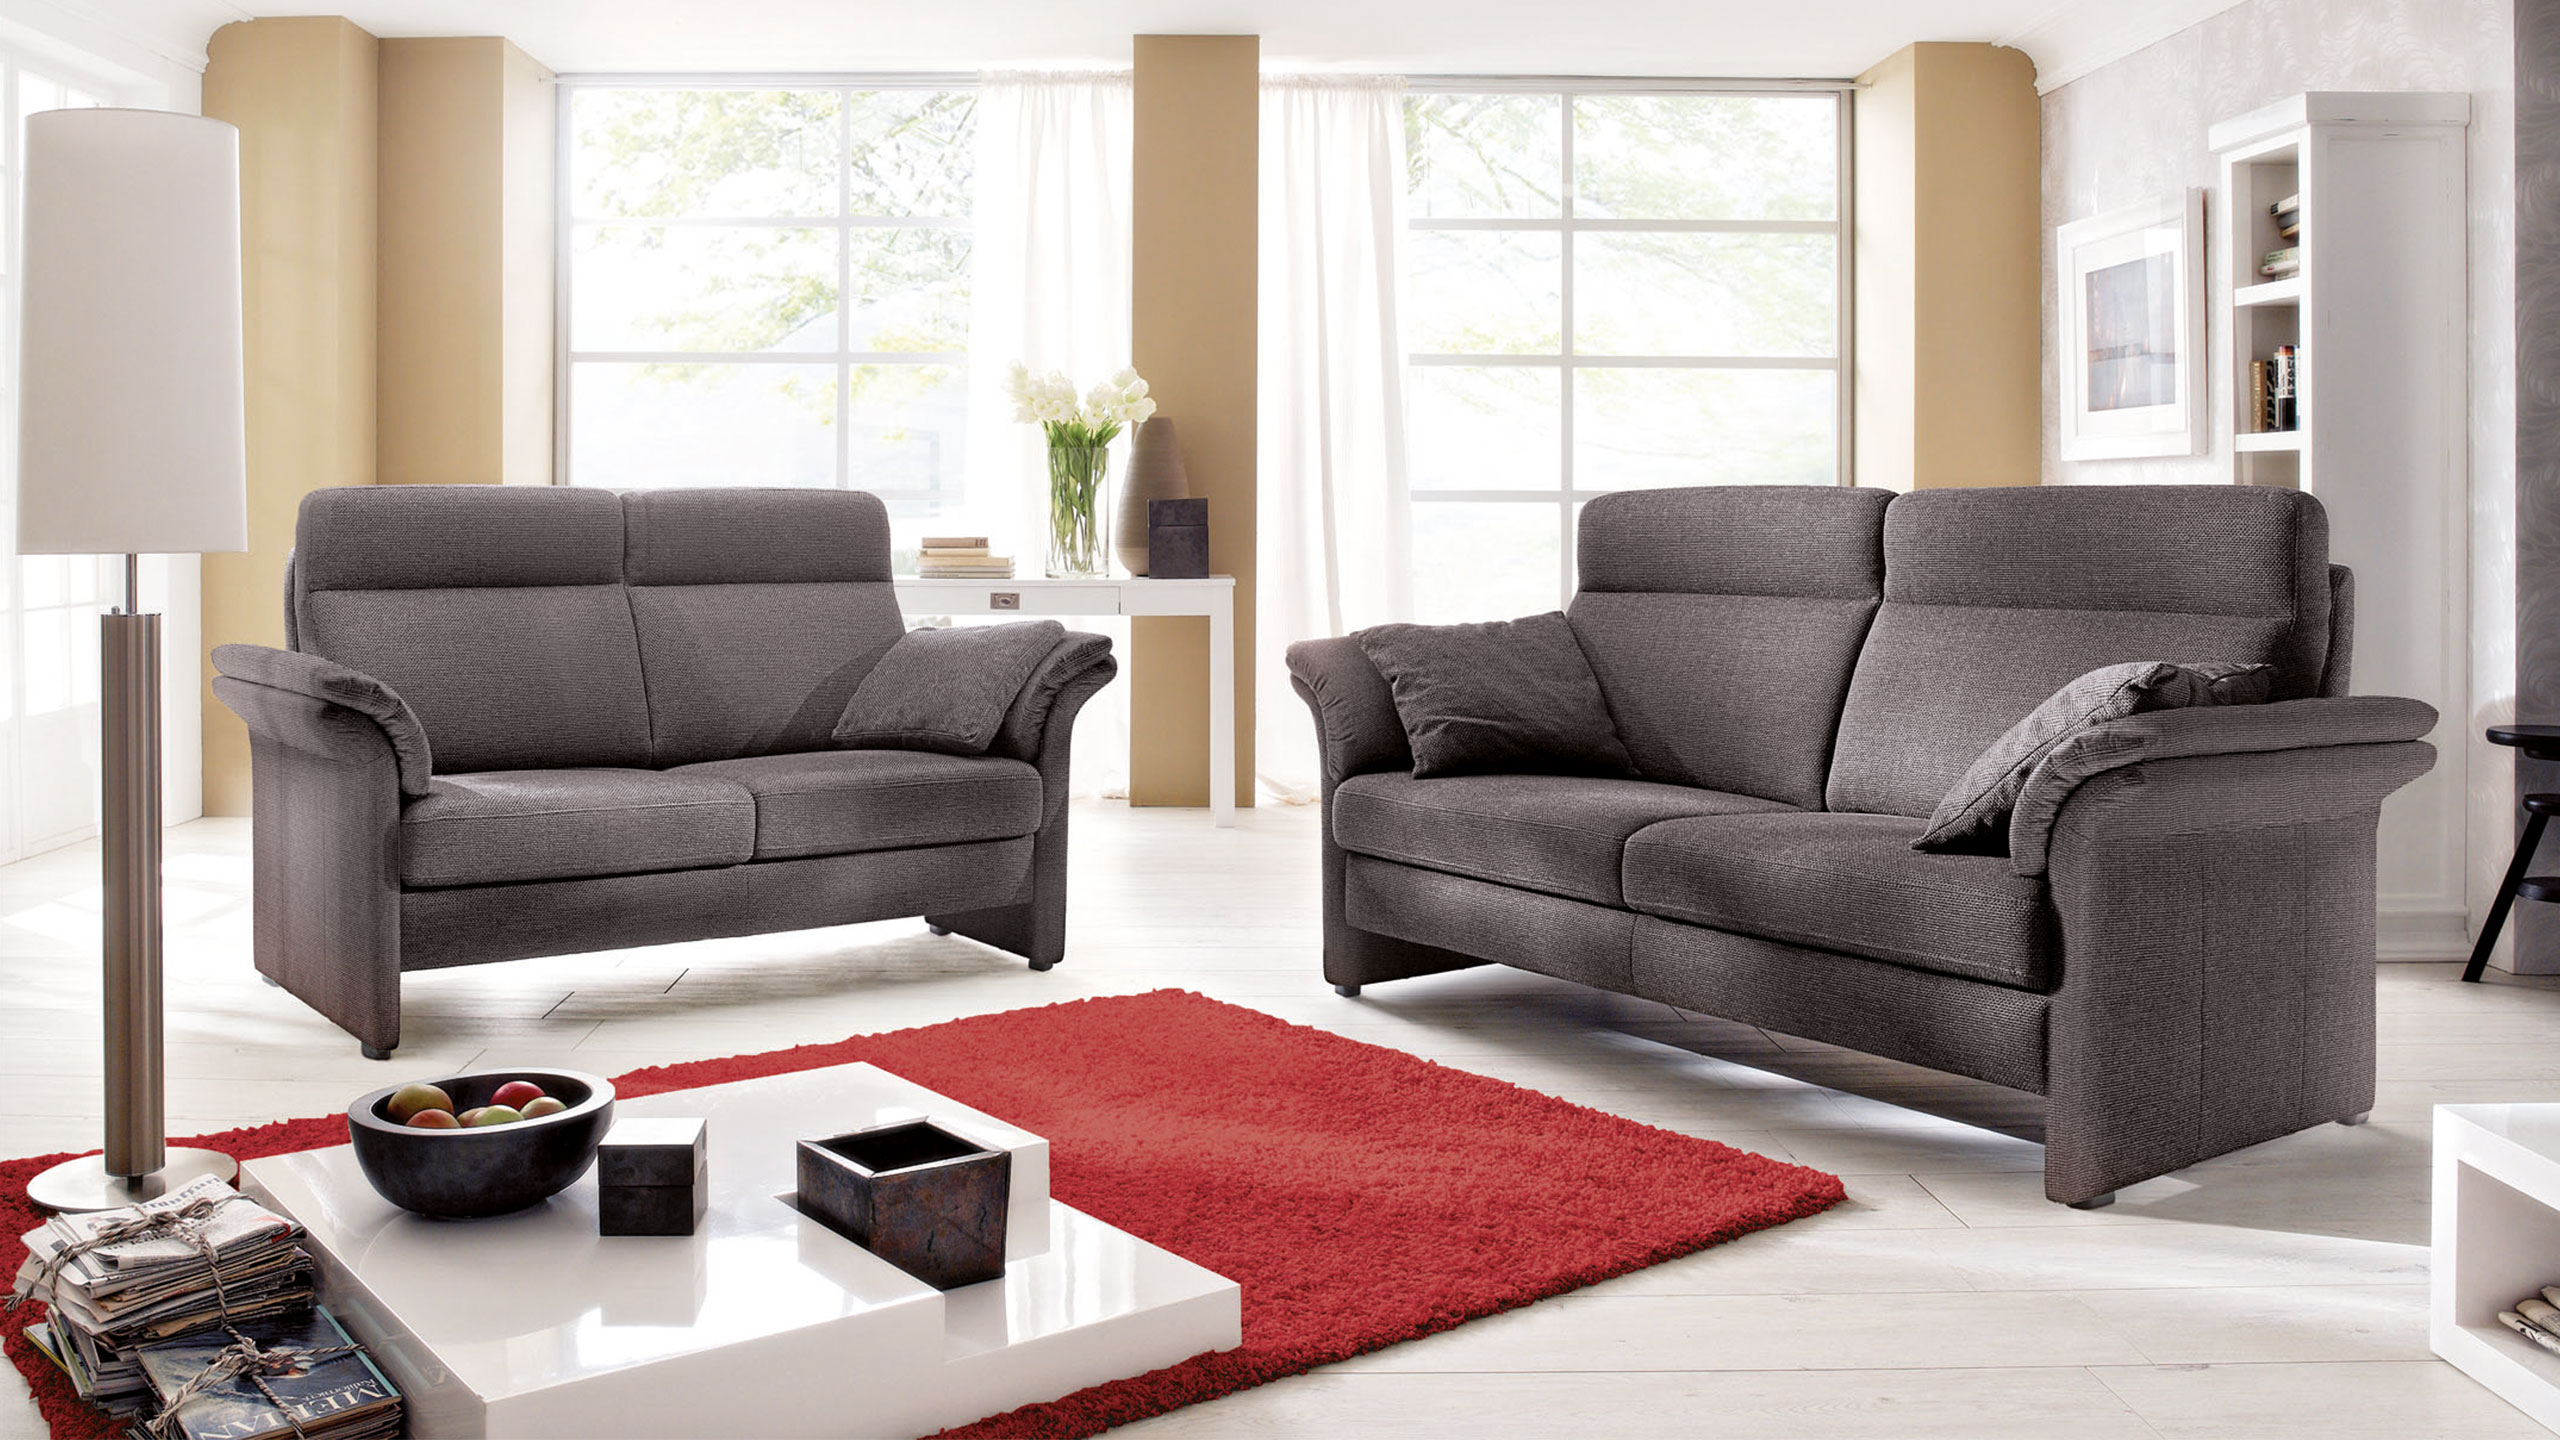 Malaga Sofa Stoff Grau